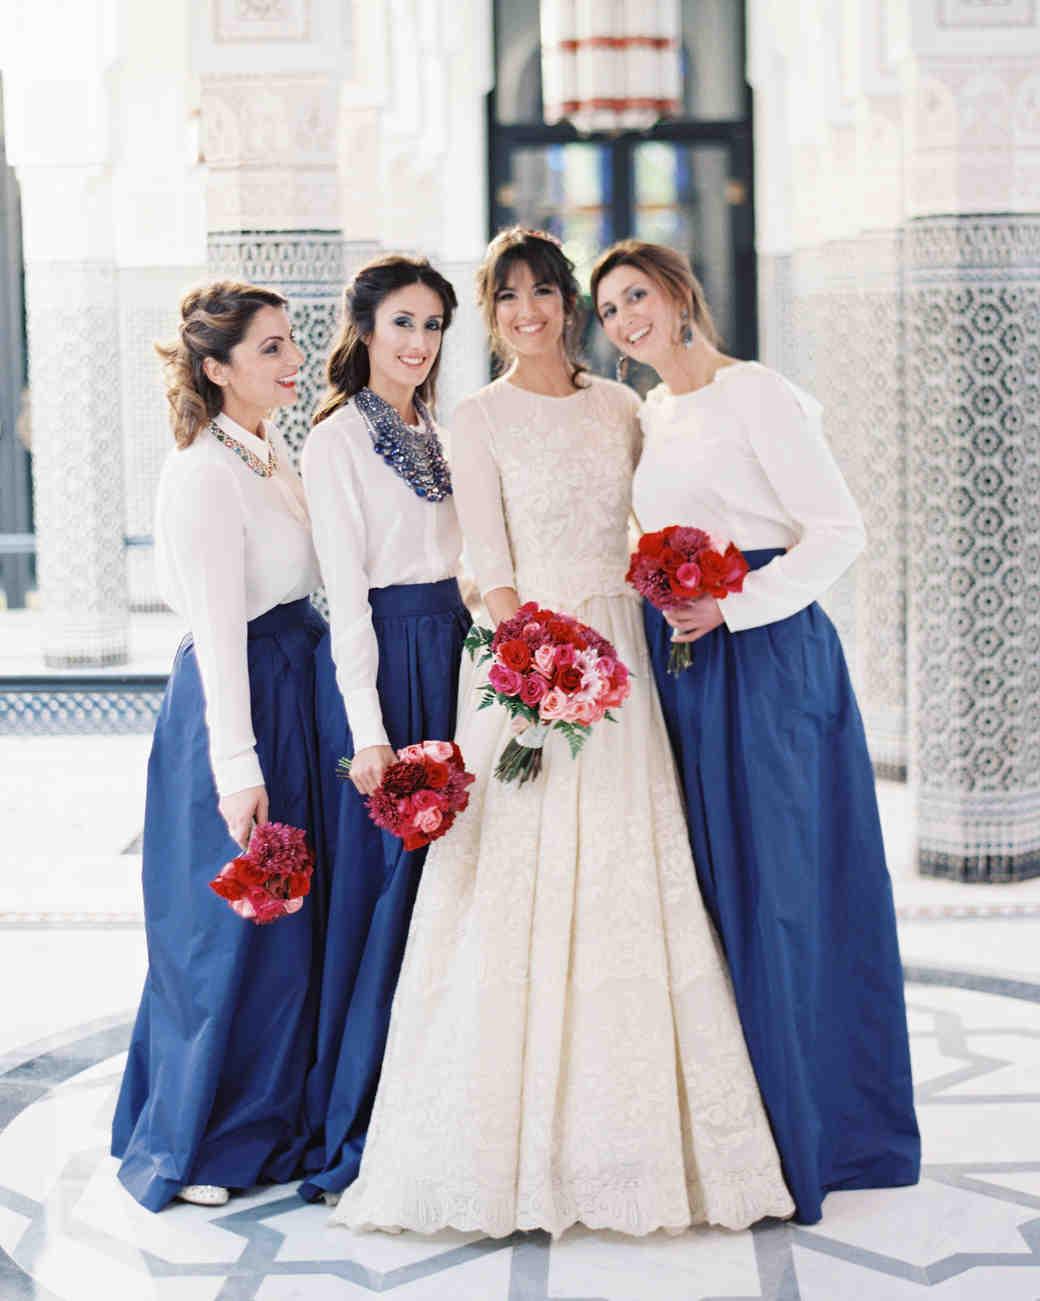 federica-tommaso-wedding-bridesmaids-050-s112330-1015.jpg